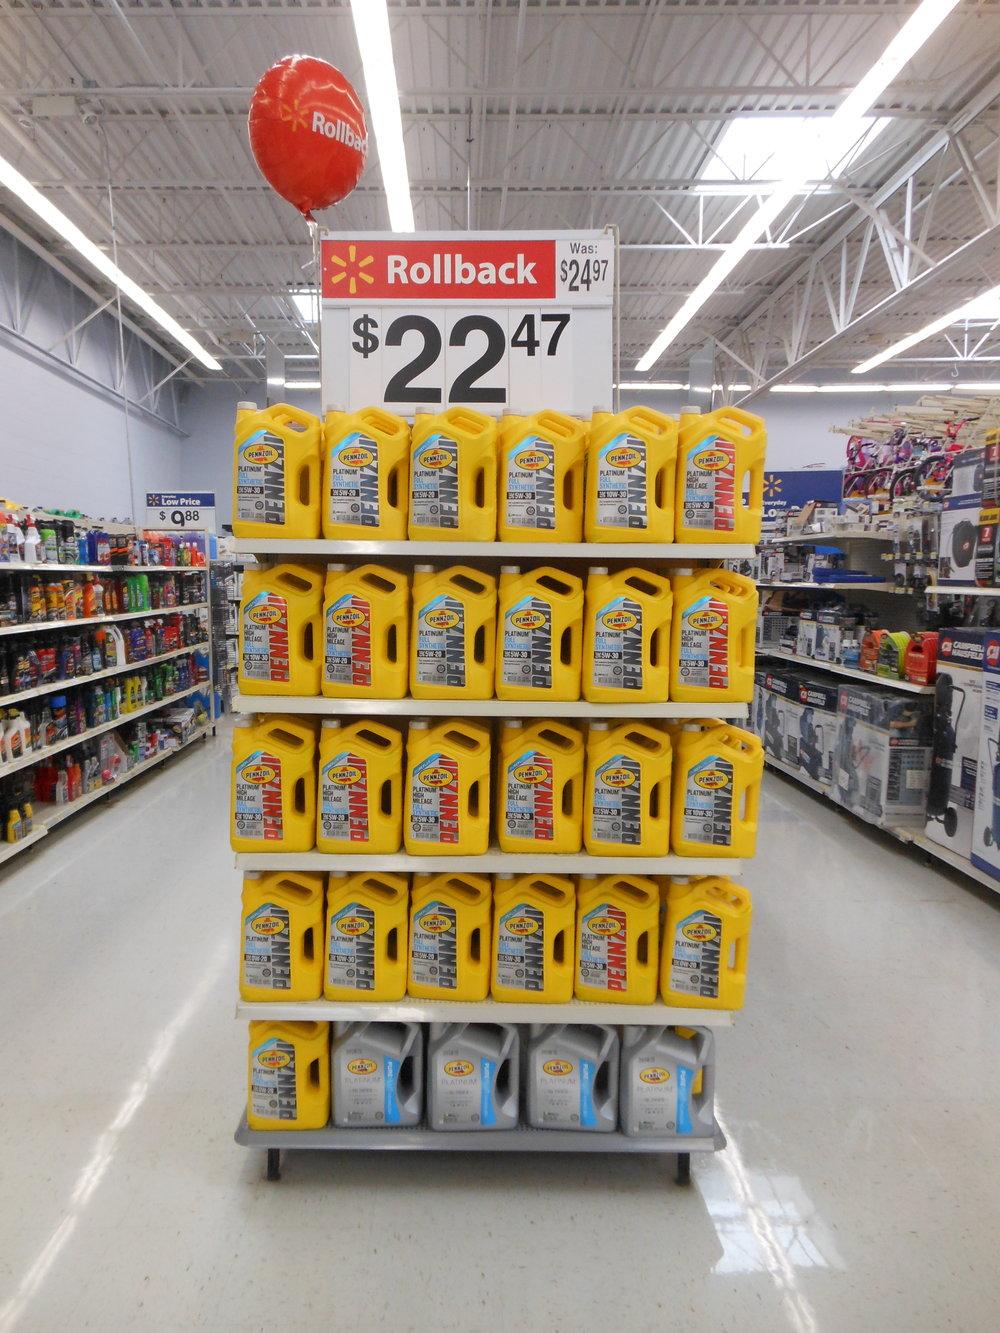 Store #3201 Pennzoil Rollback